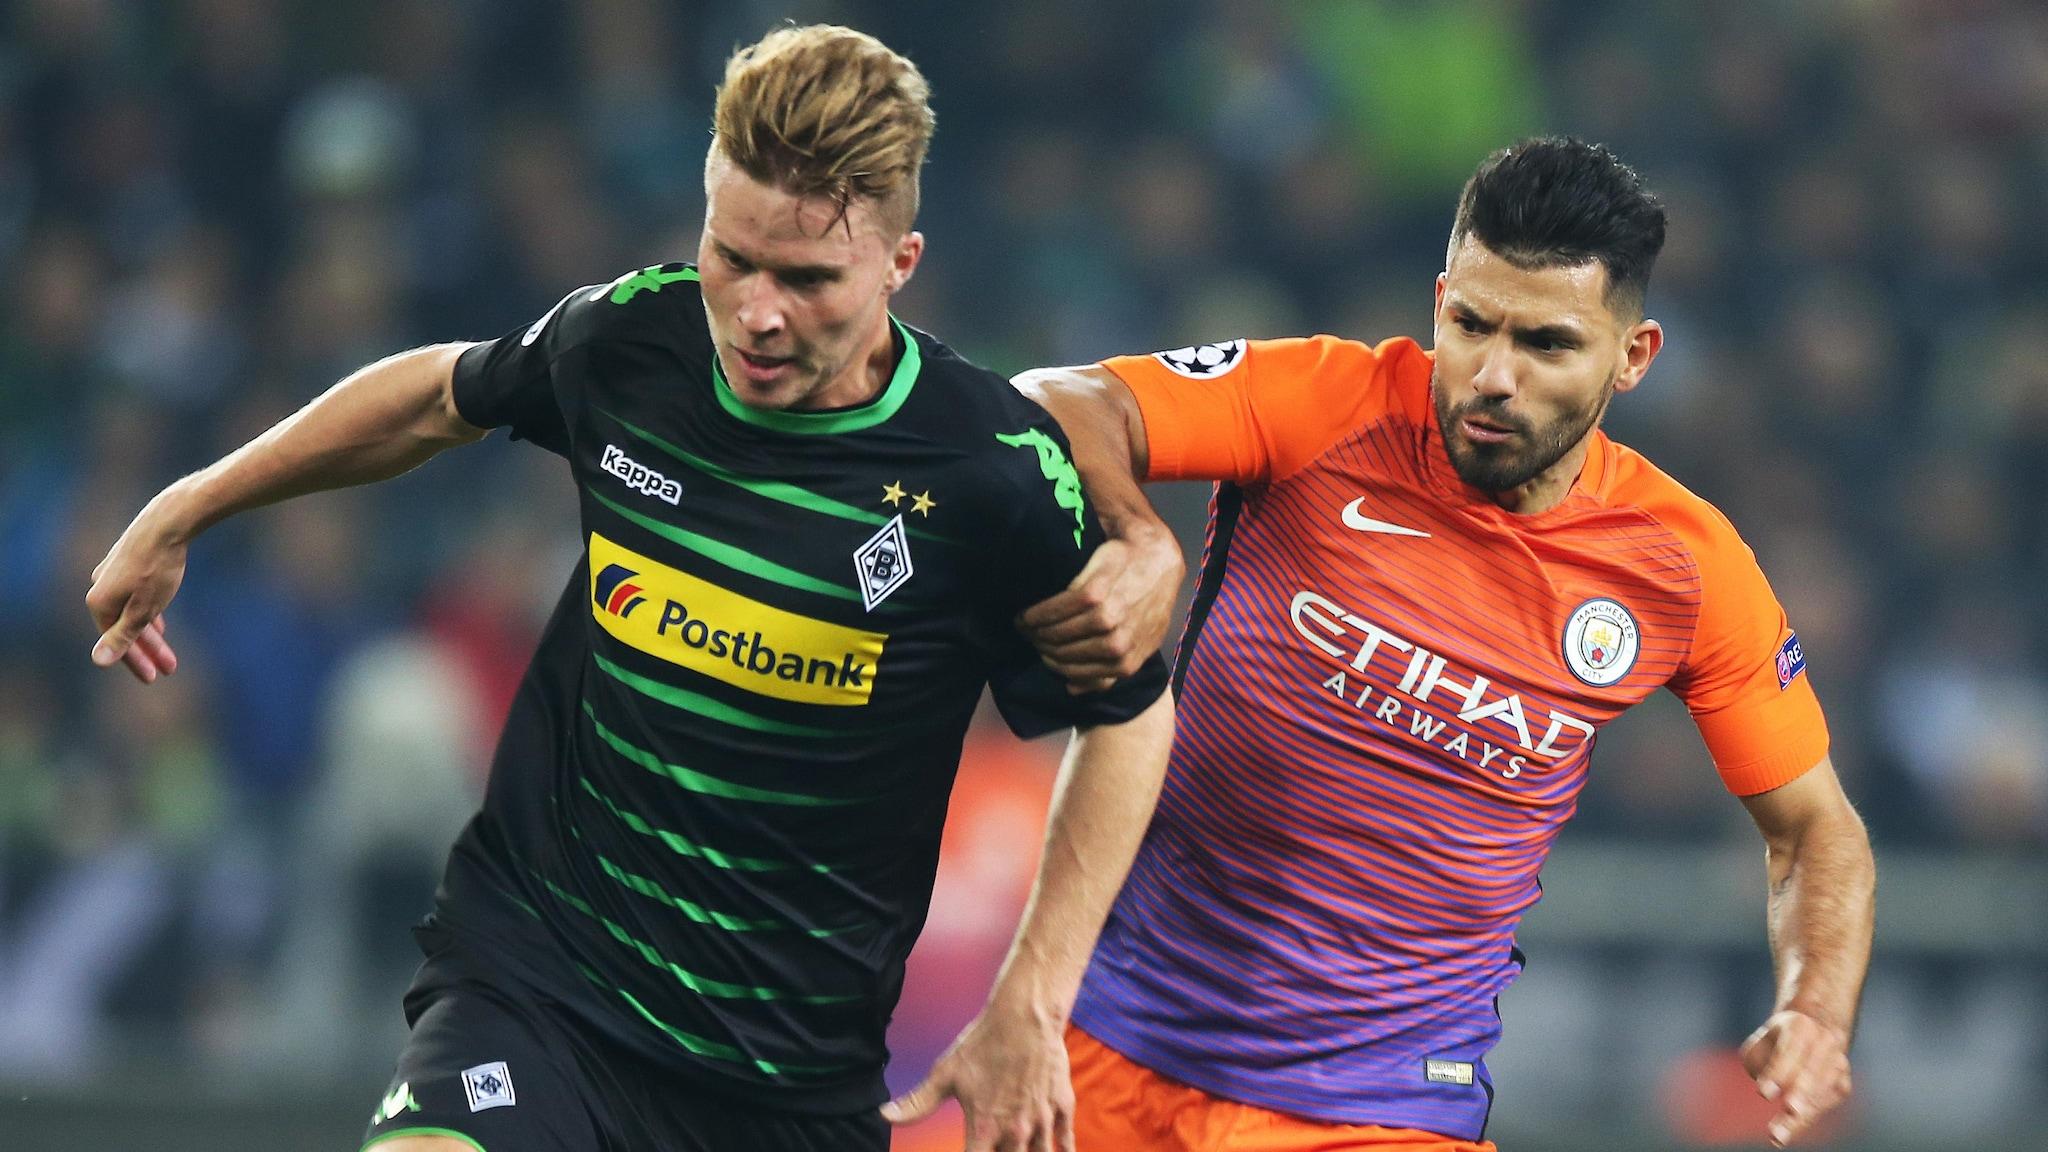 Mönchengladbach-Man. City | Mönchengladbach - Manchester City: Zahlen,  Fakten & Personalien | UEFA Champions League